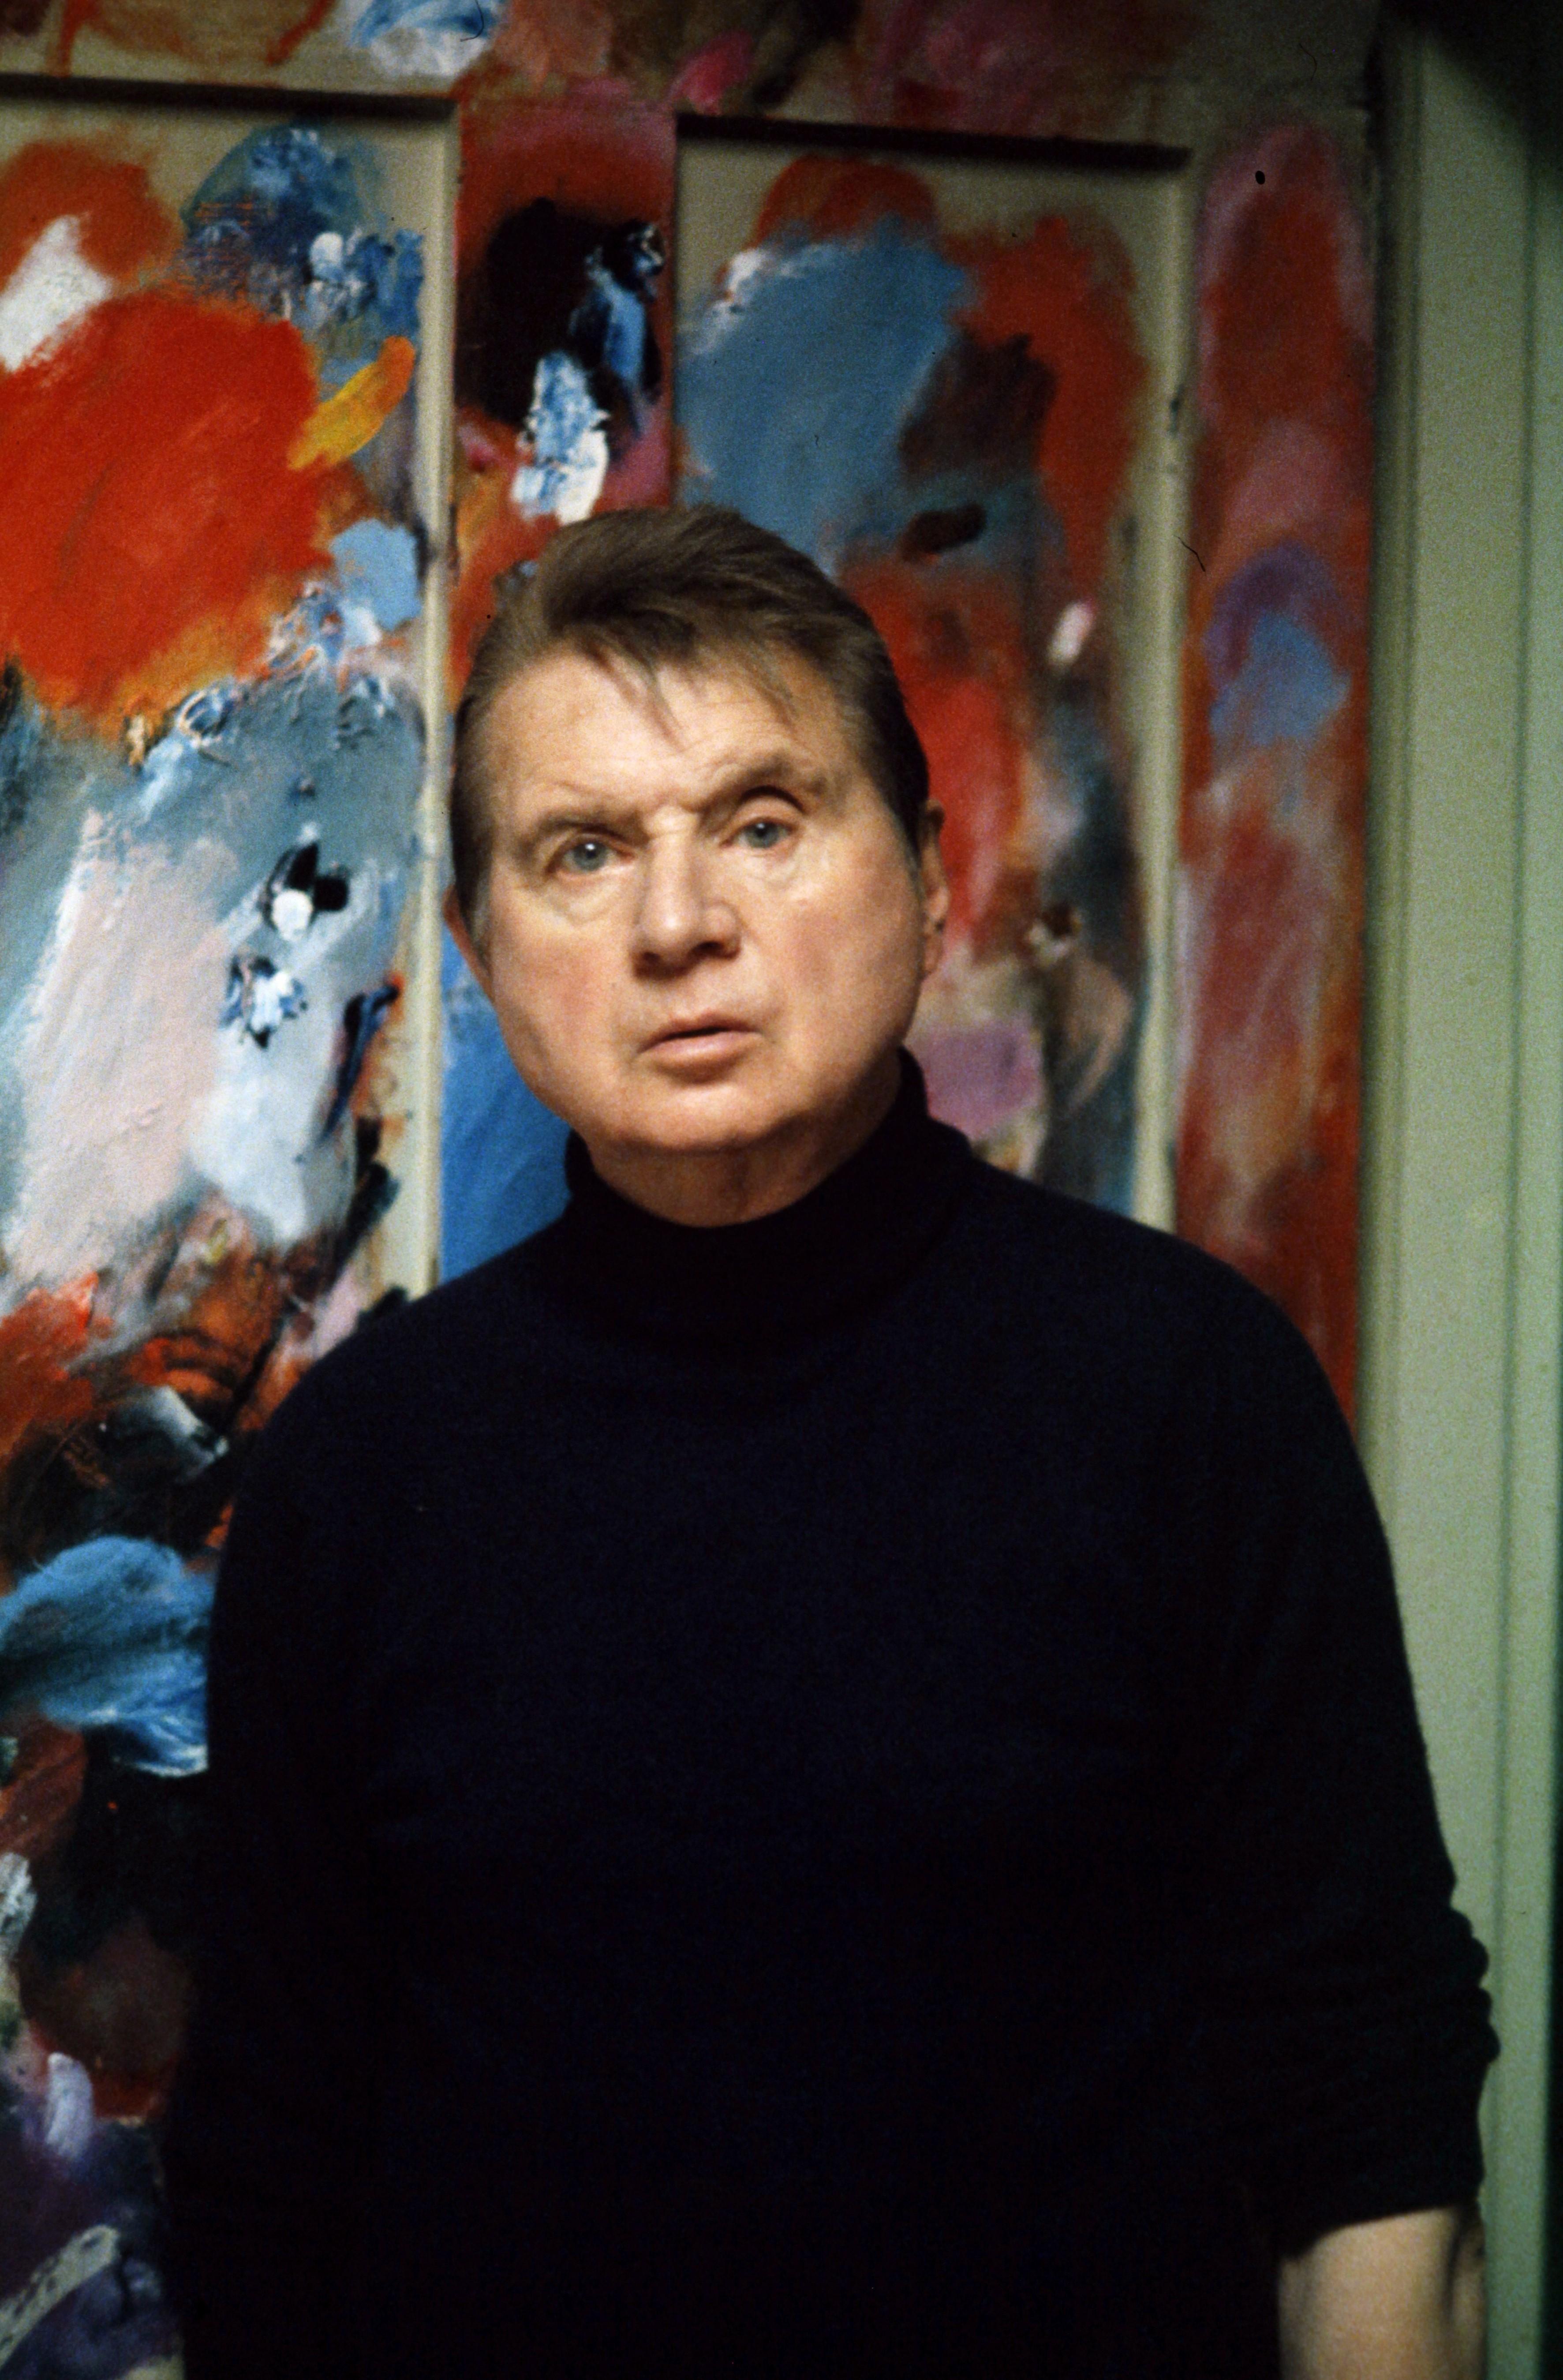 Francis Bacon in seinem Atelier. Foto: Edward Quinn, 1979. Edward Quinn Archive. Copyright edwardquinn.com